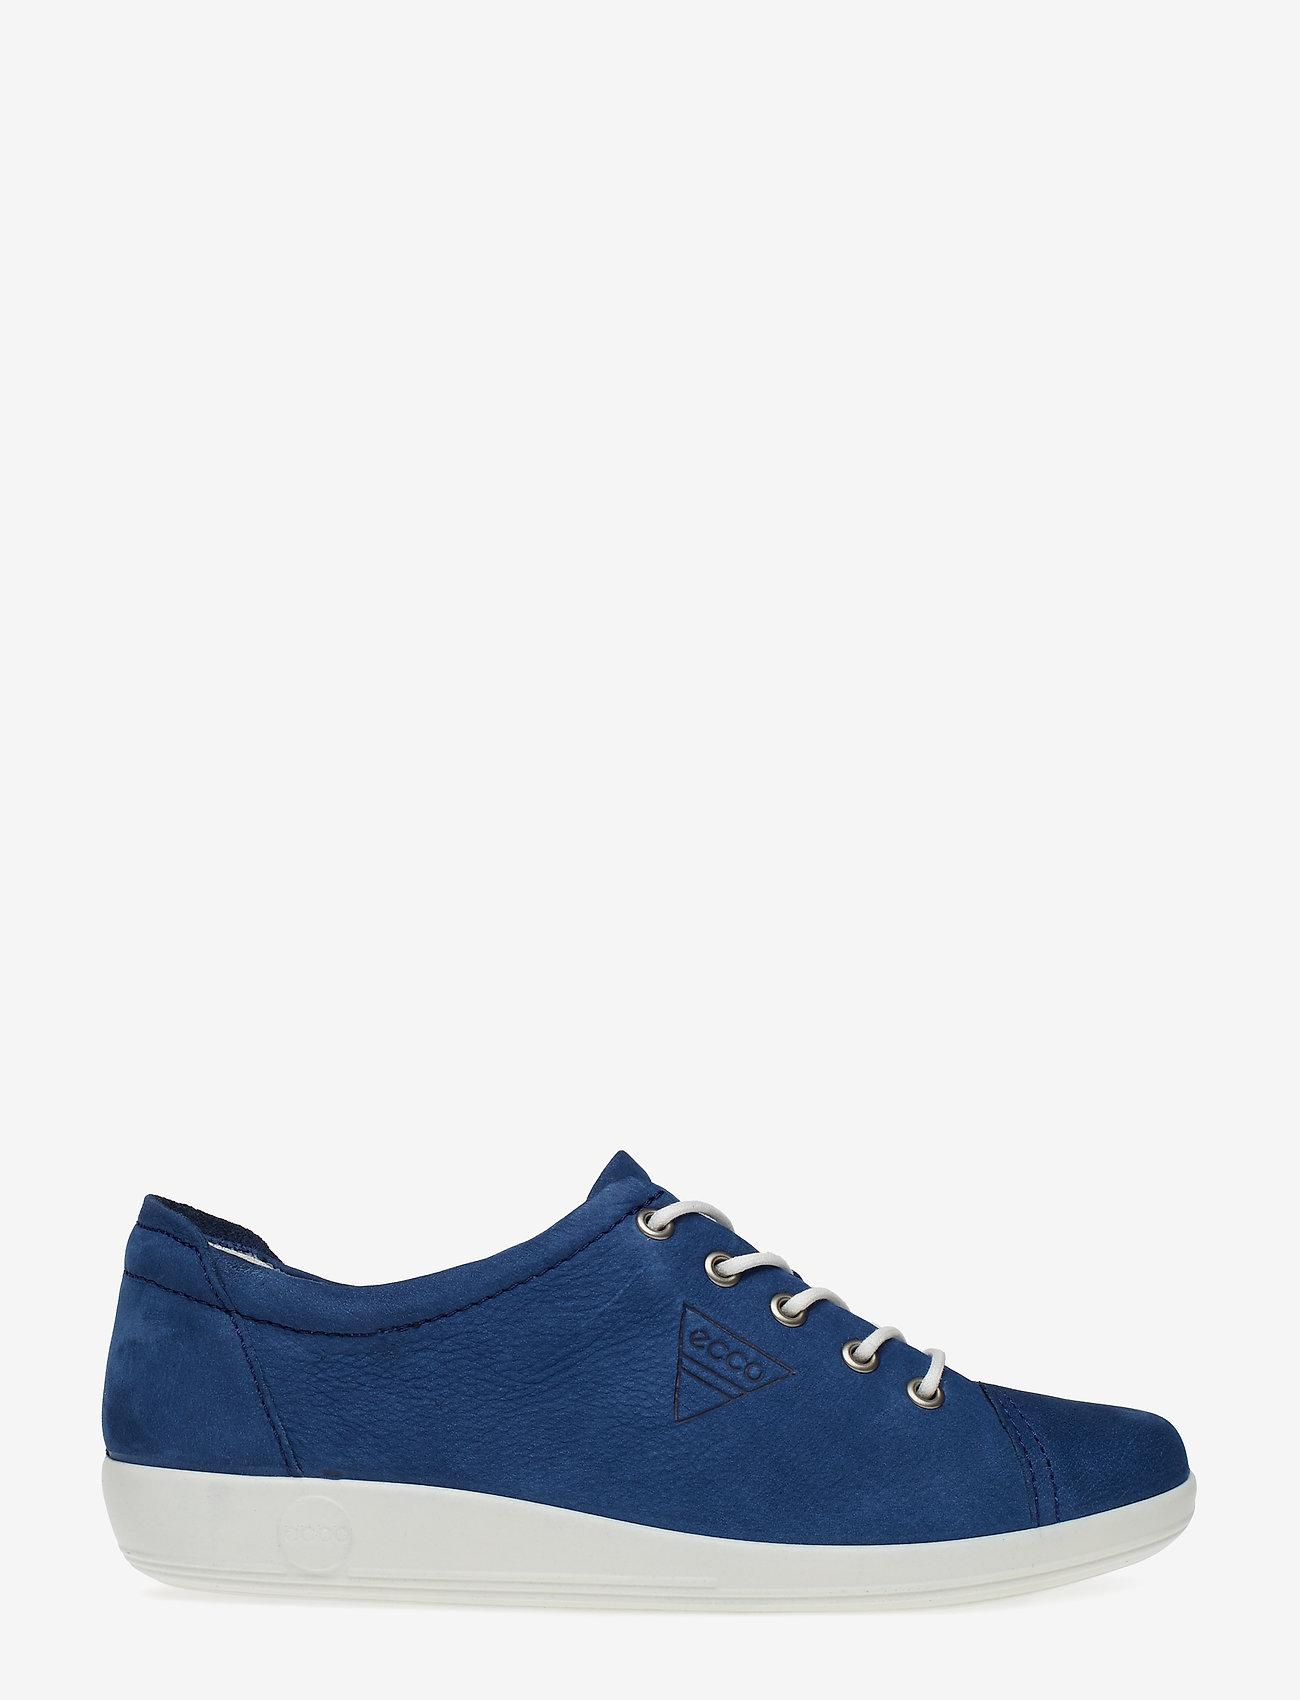 ECCO - SOFT 2.0 - låga sneakers - true navy - 1